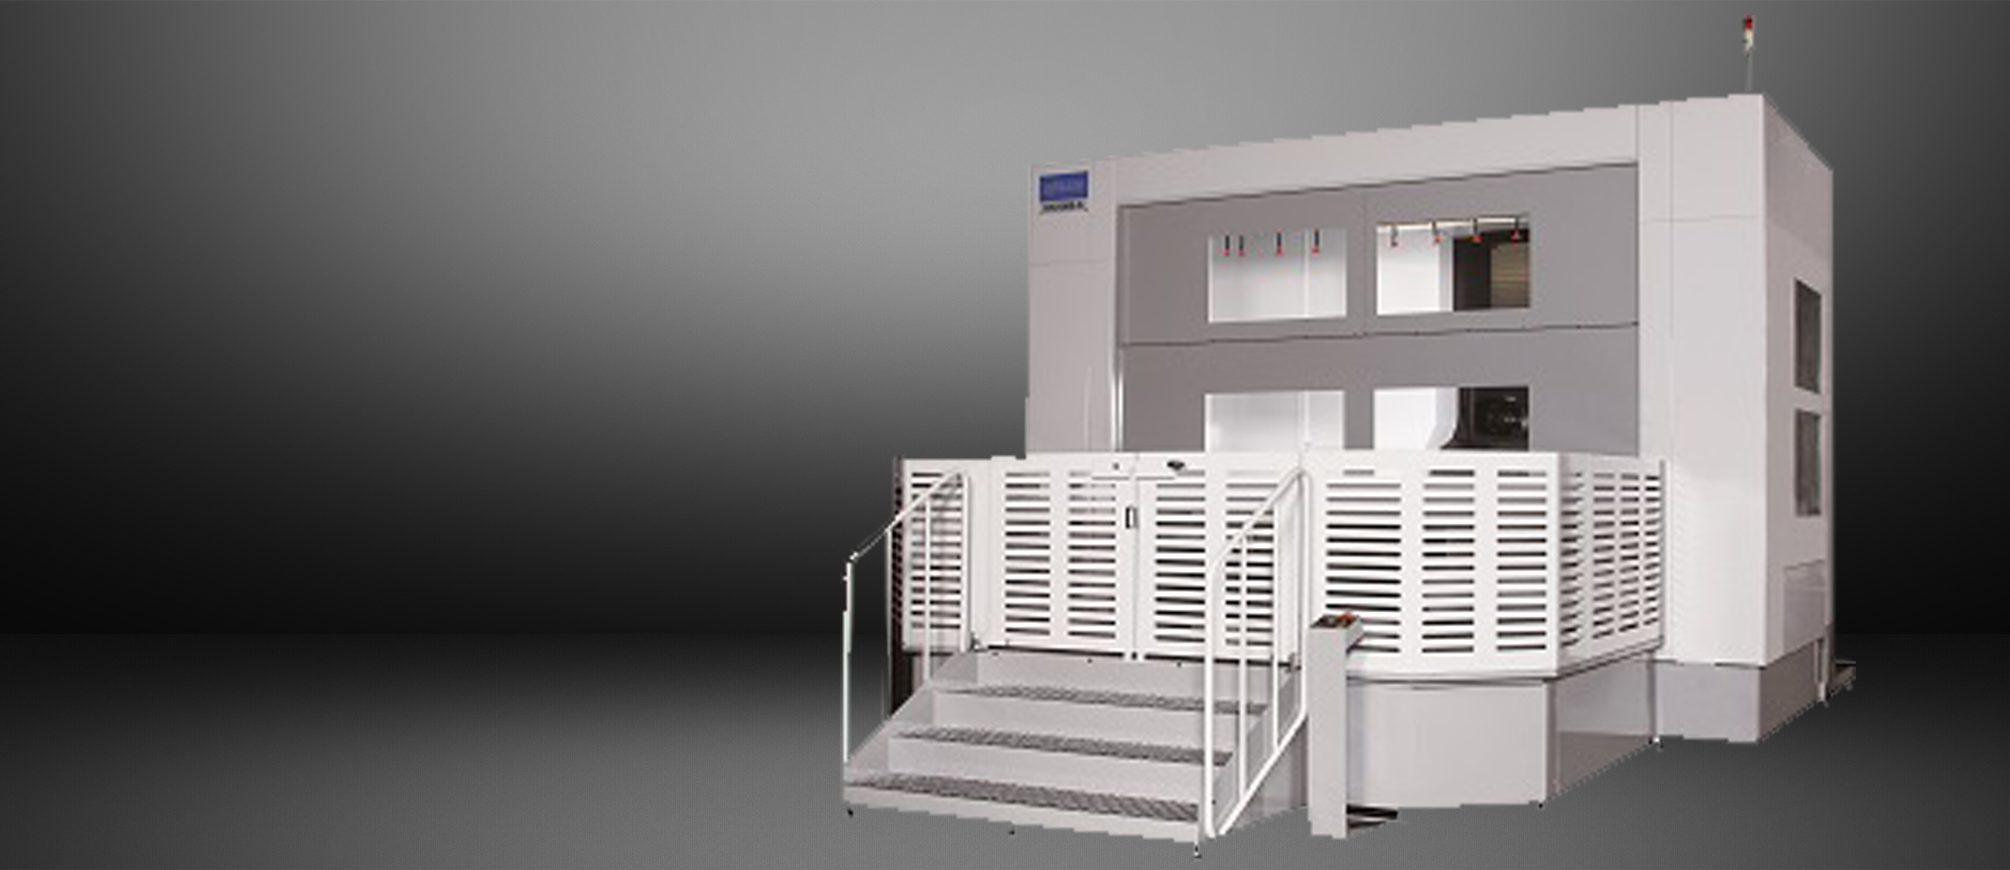 HN100D-II BAR Horizontal Machining Centers